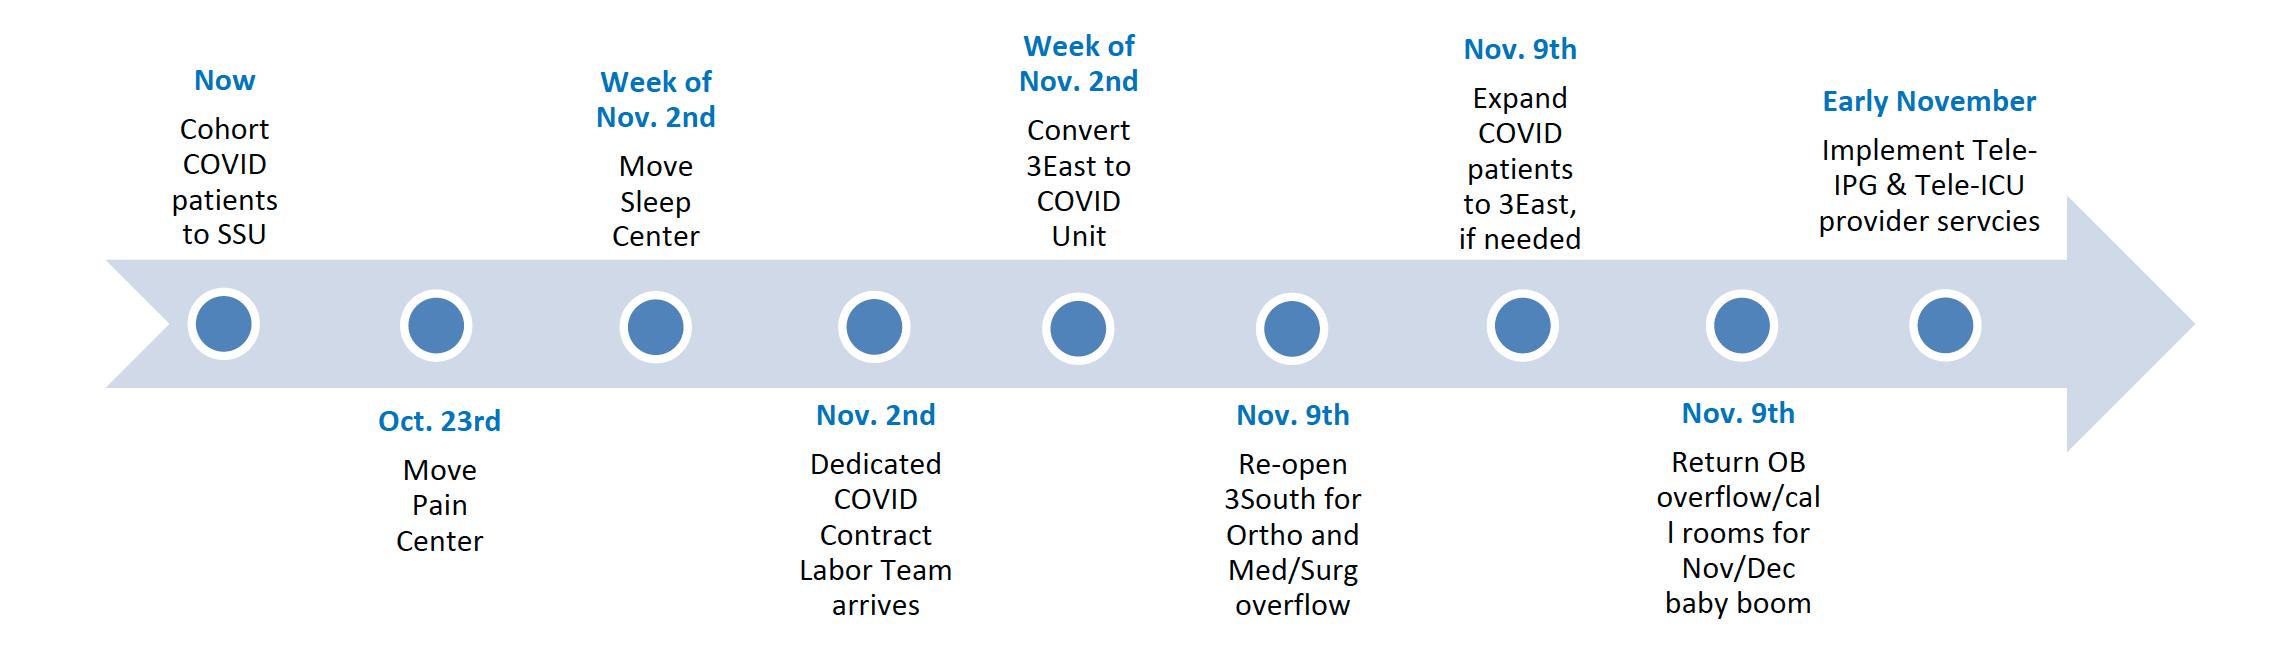 Image: COVID Staffing Plan Timeline